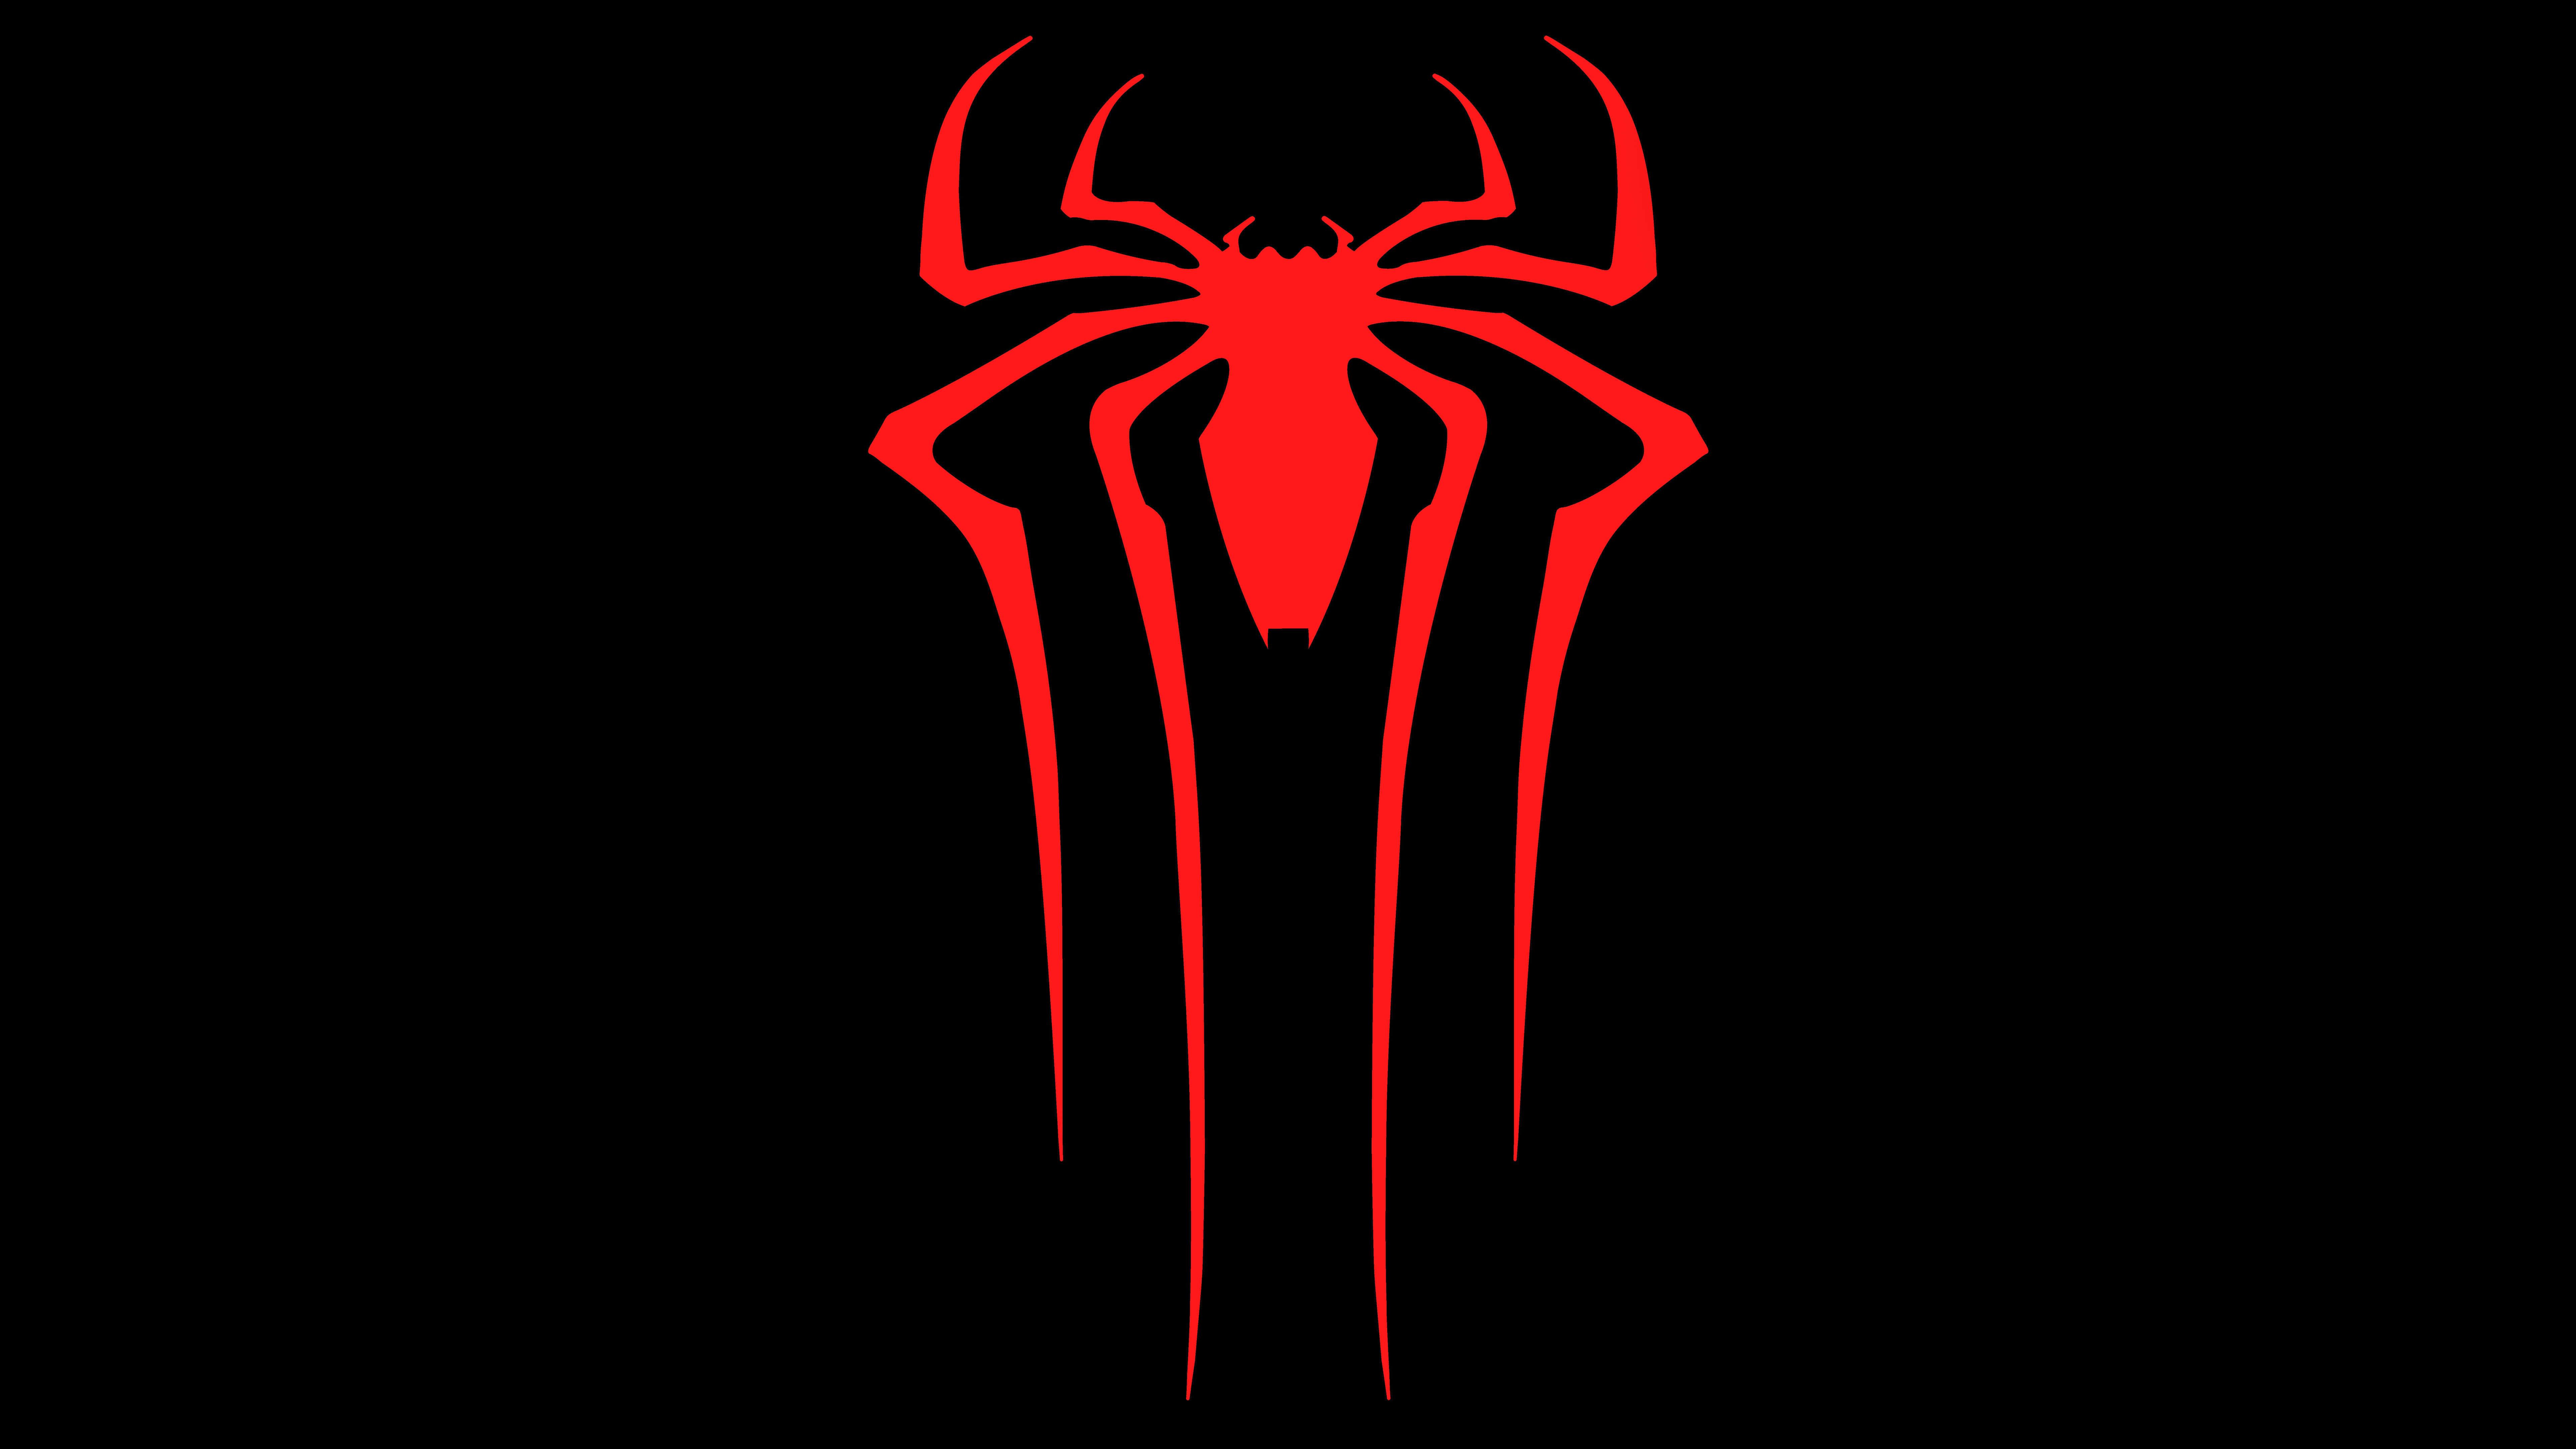 The Amazing Spiderman 2 UHD 8K Wallpaper | Pixelz